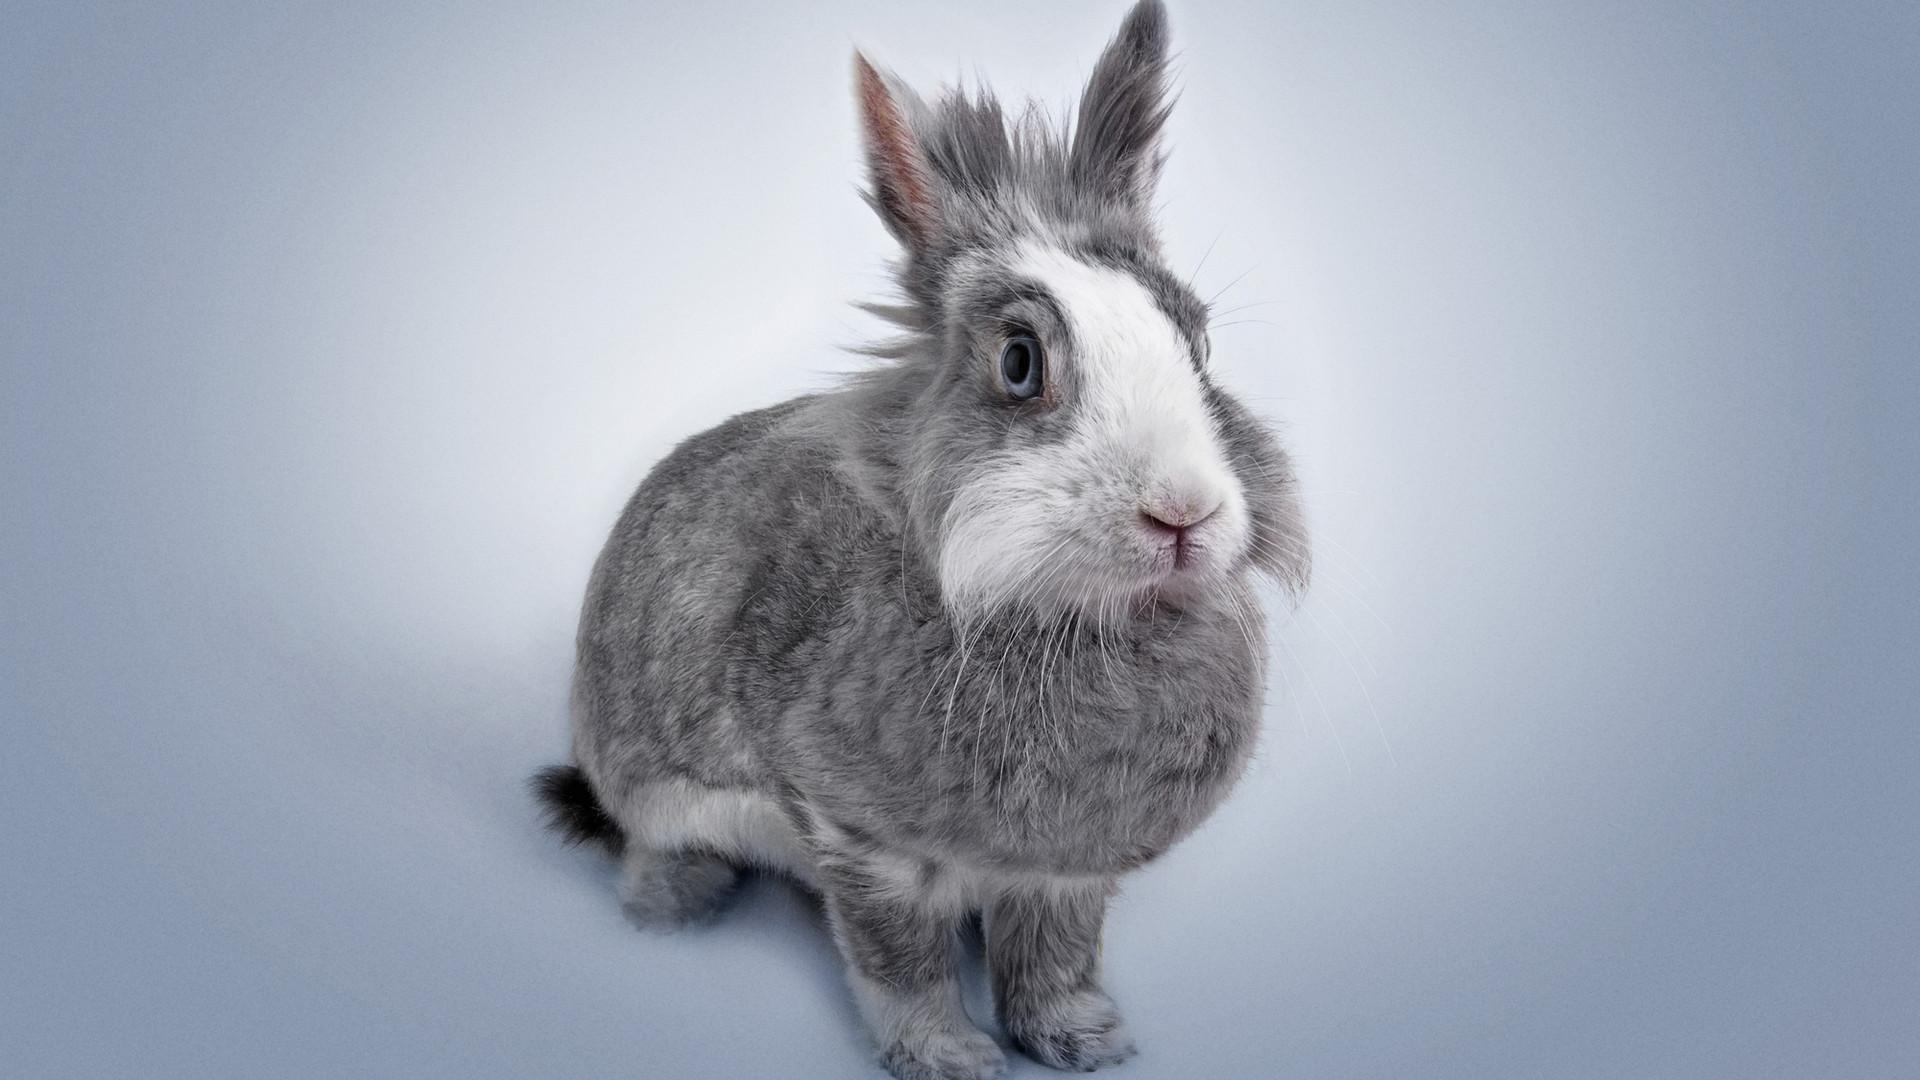 adorable-animal-cute-domestic-583676.jpg